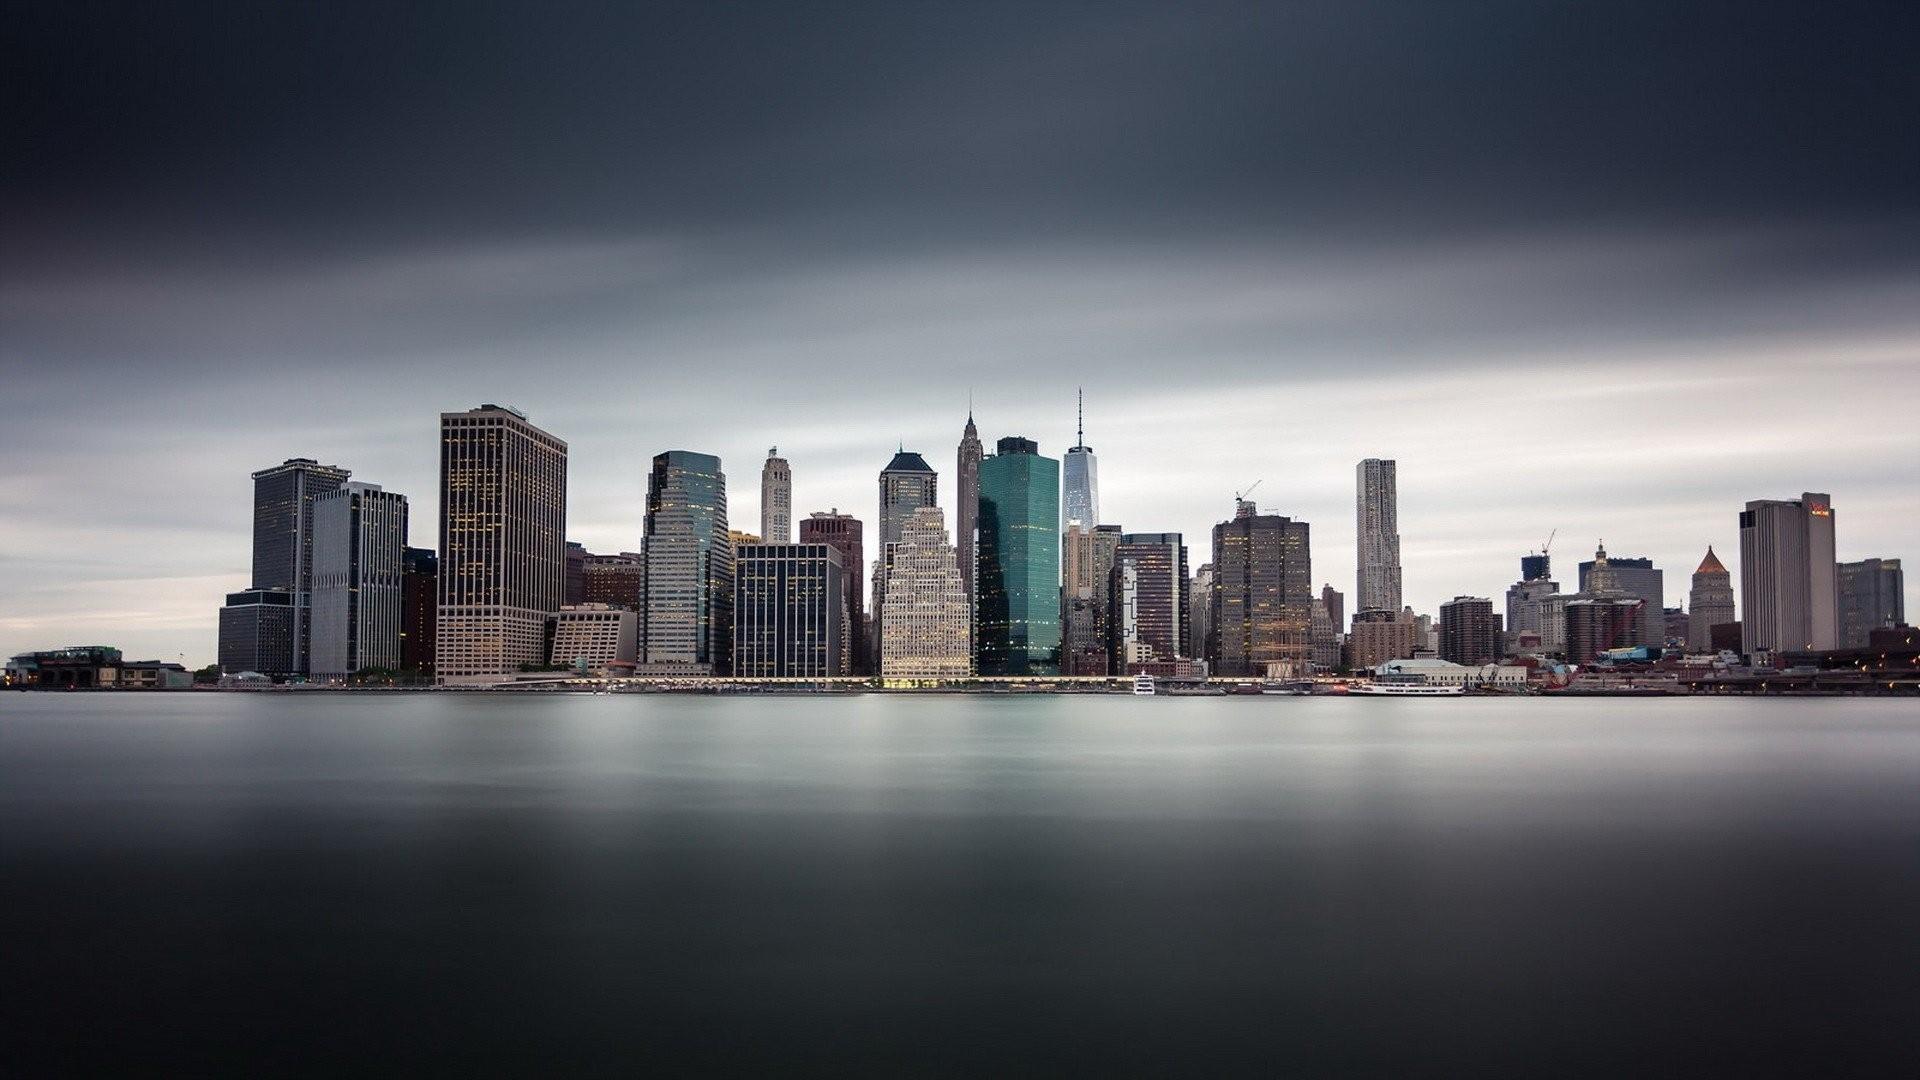 New York City wallpaper photo hd